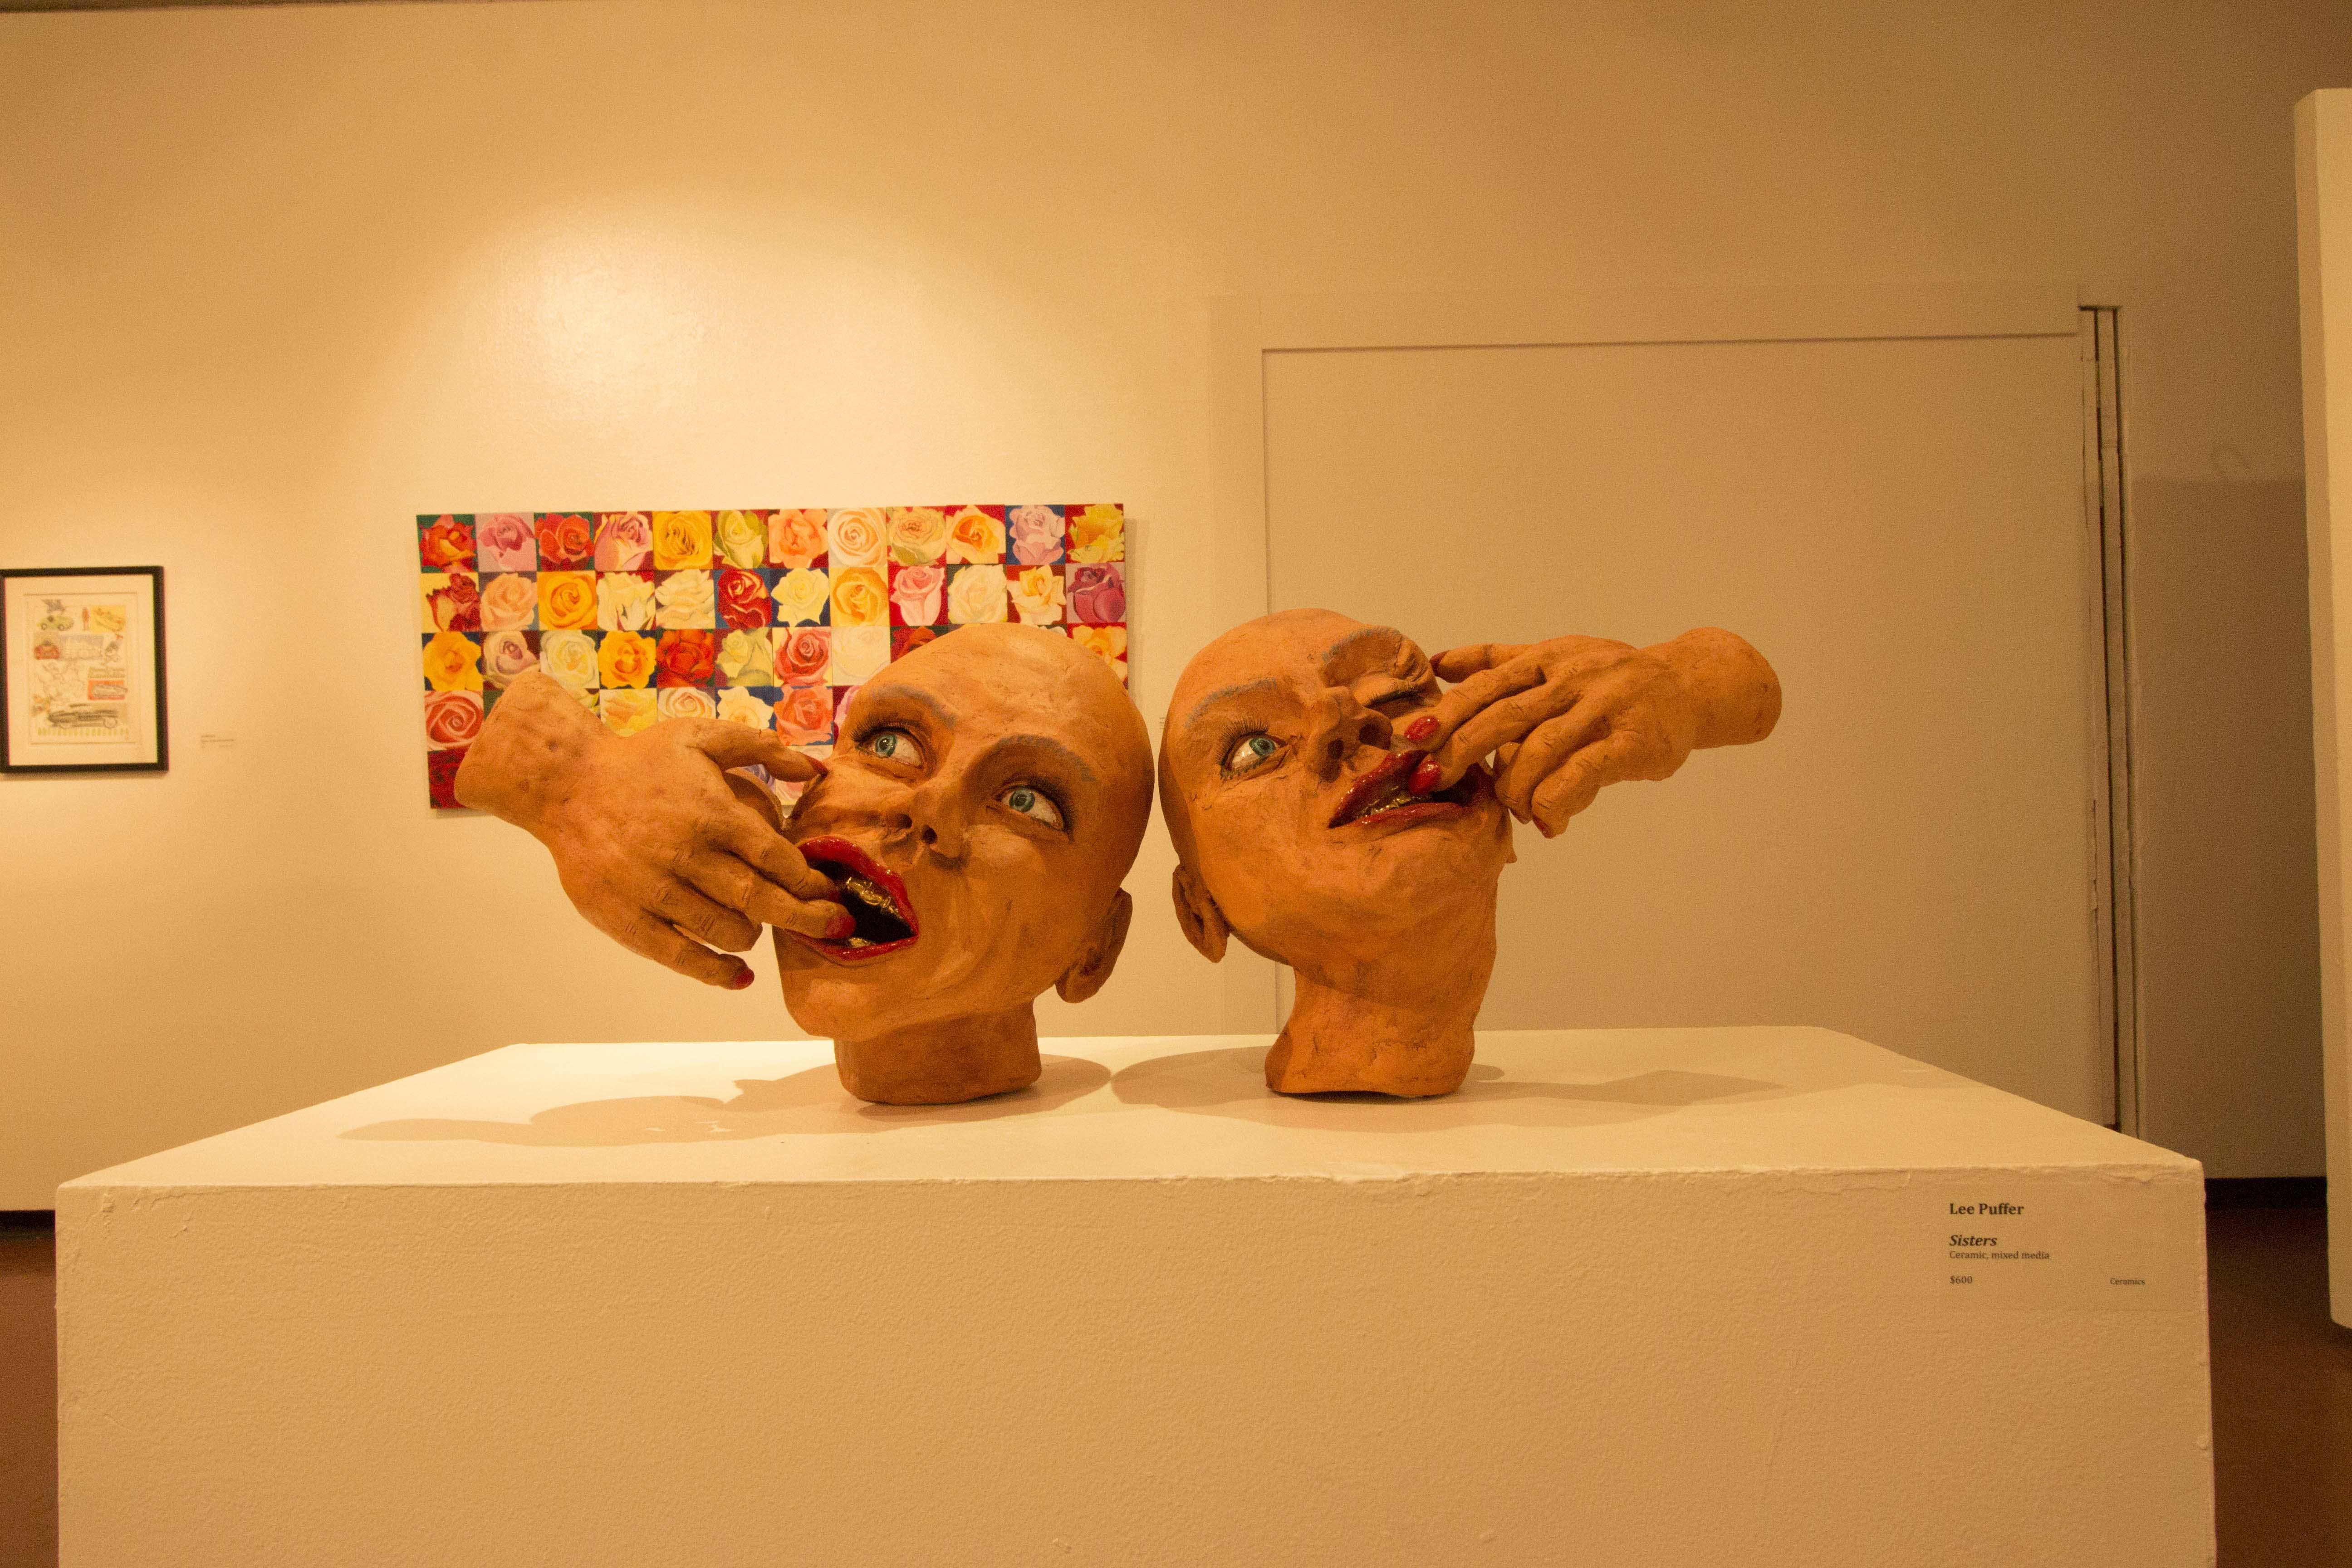 Dec. 3, 2014, San Marcos, Calif. Teacher art show at the Boehm Gallery. Paul Nelson/The Telescope